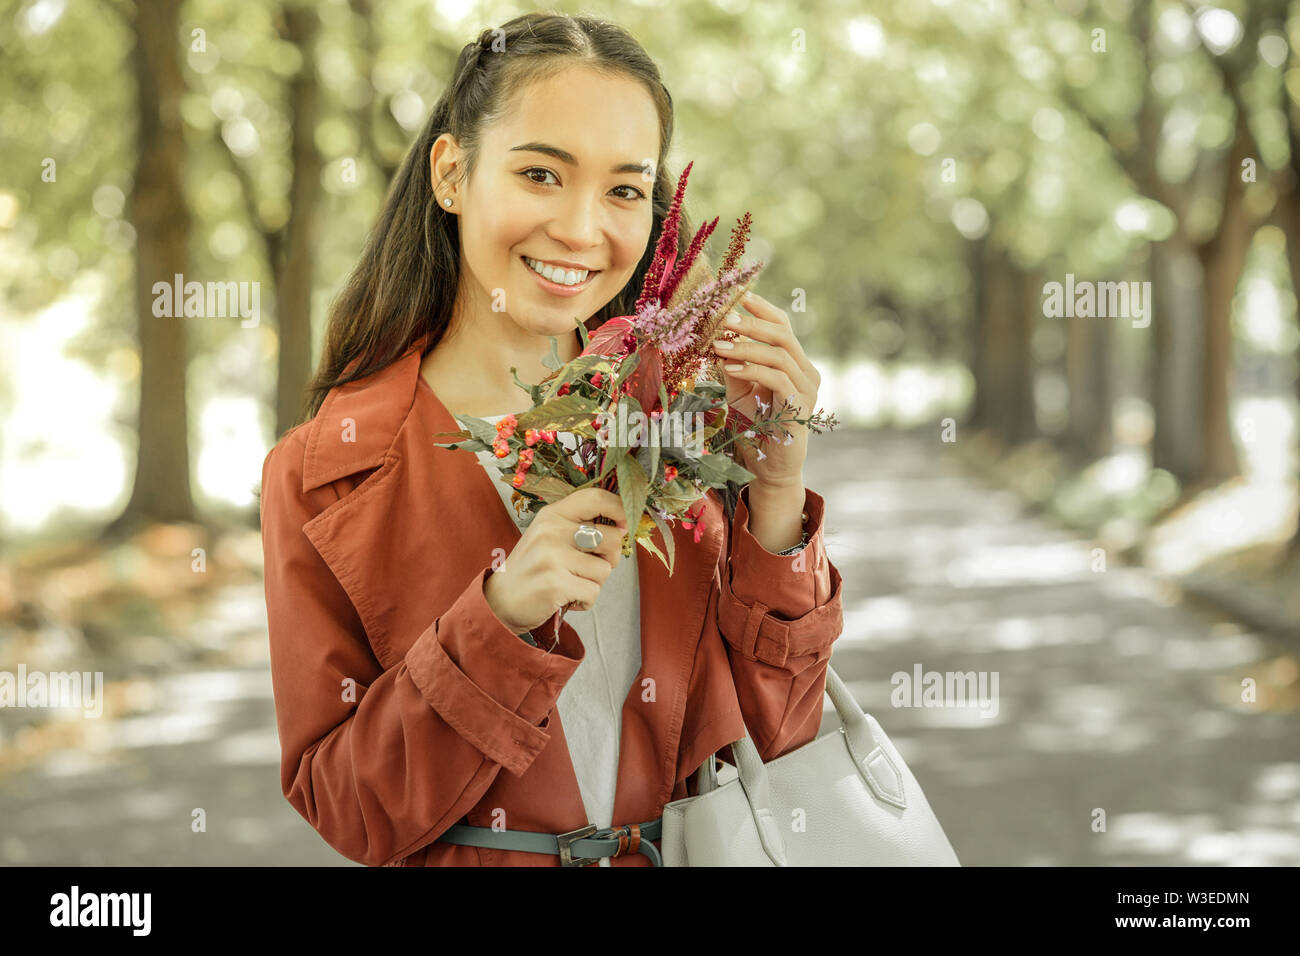 Cheerful appel dame maintenant assez fleurs'' Photo Stock